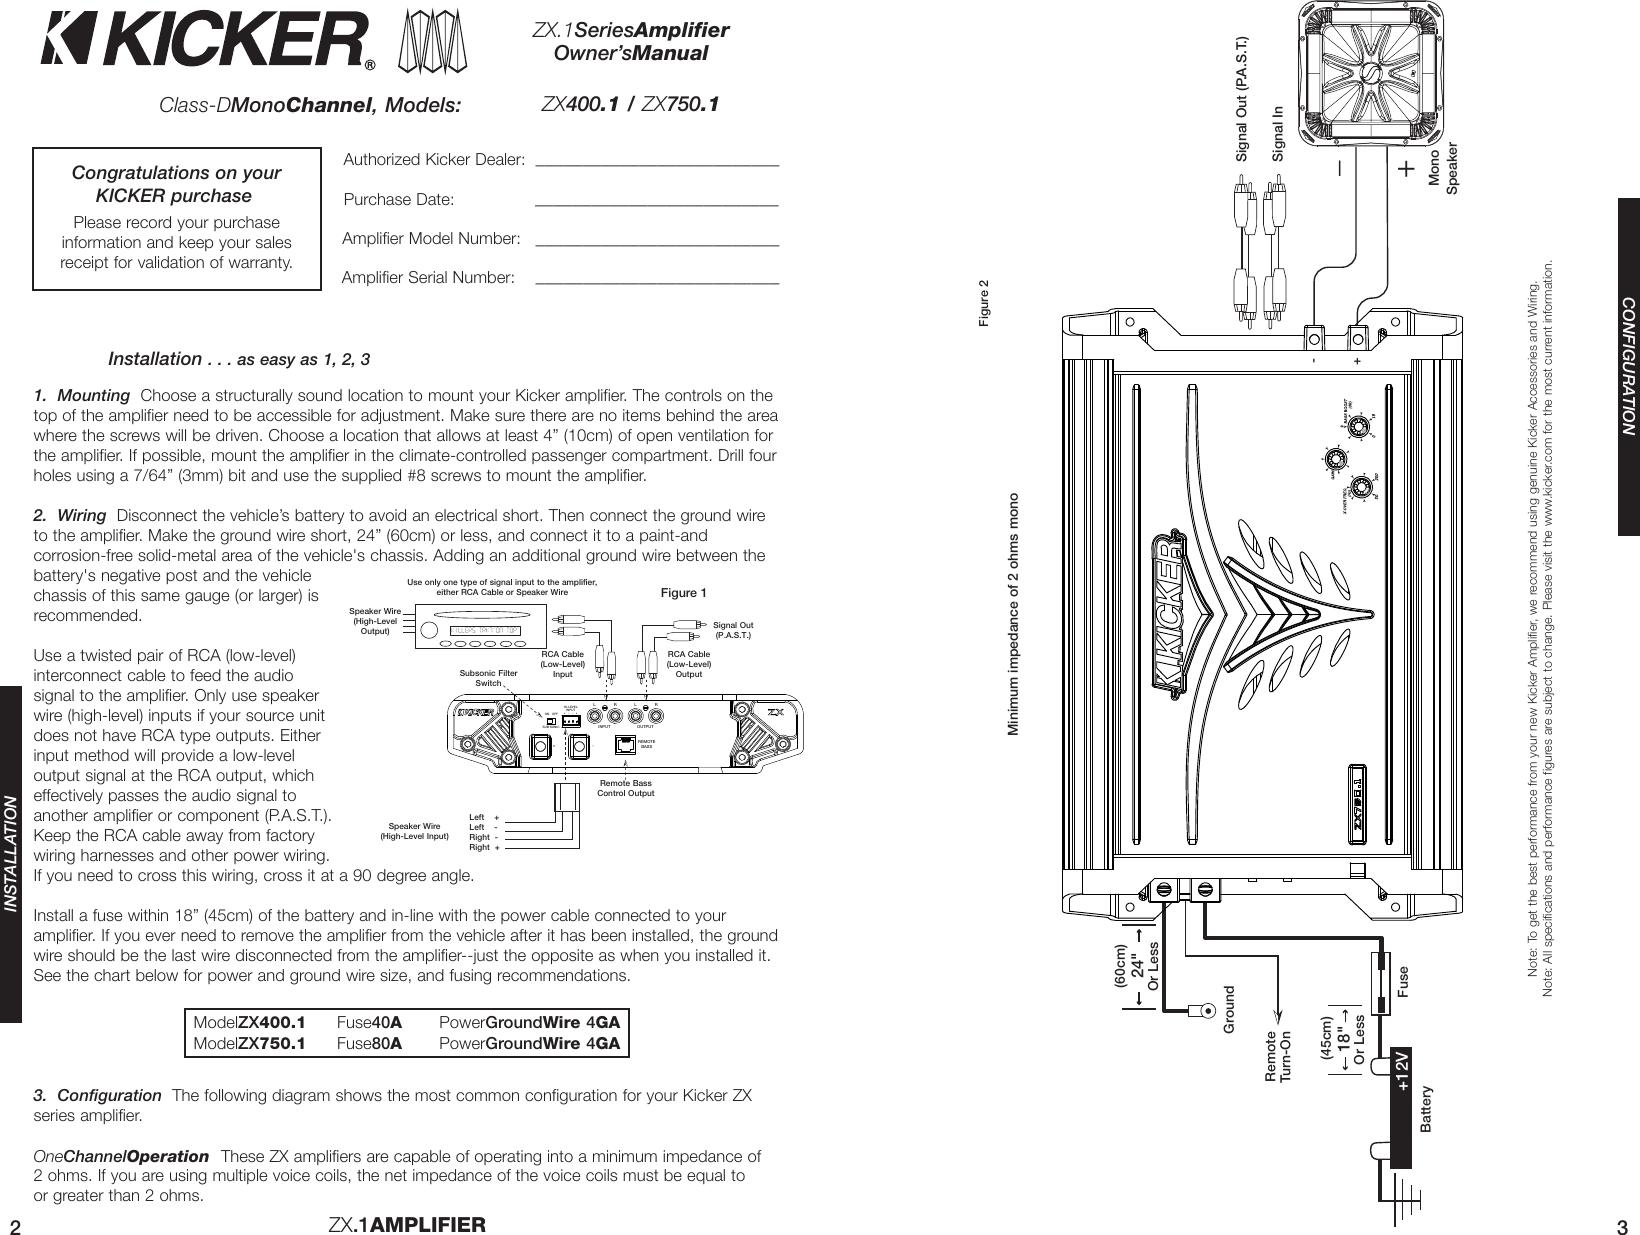 hight resolution of kicker 2006 zx 400 1 and 700 owners manual zx400 750 4in1 a01 qxp kicker 11 zx750 1 kicker zx400 1 wiring diagram